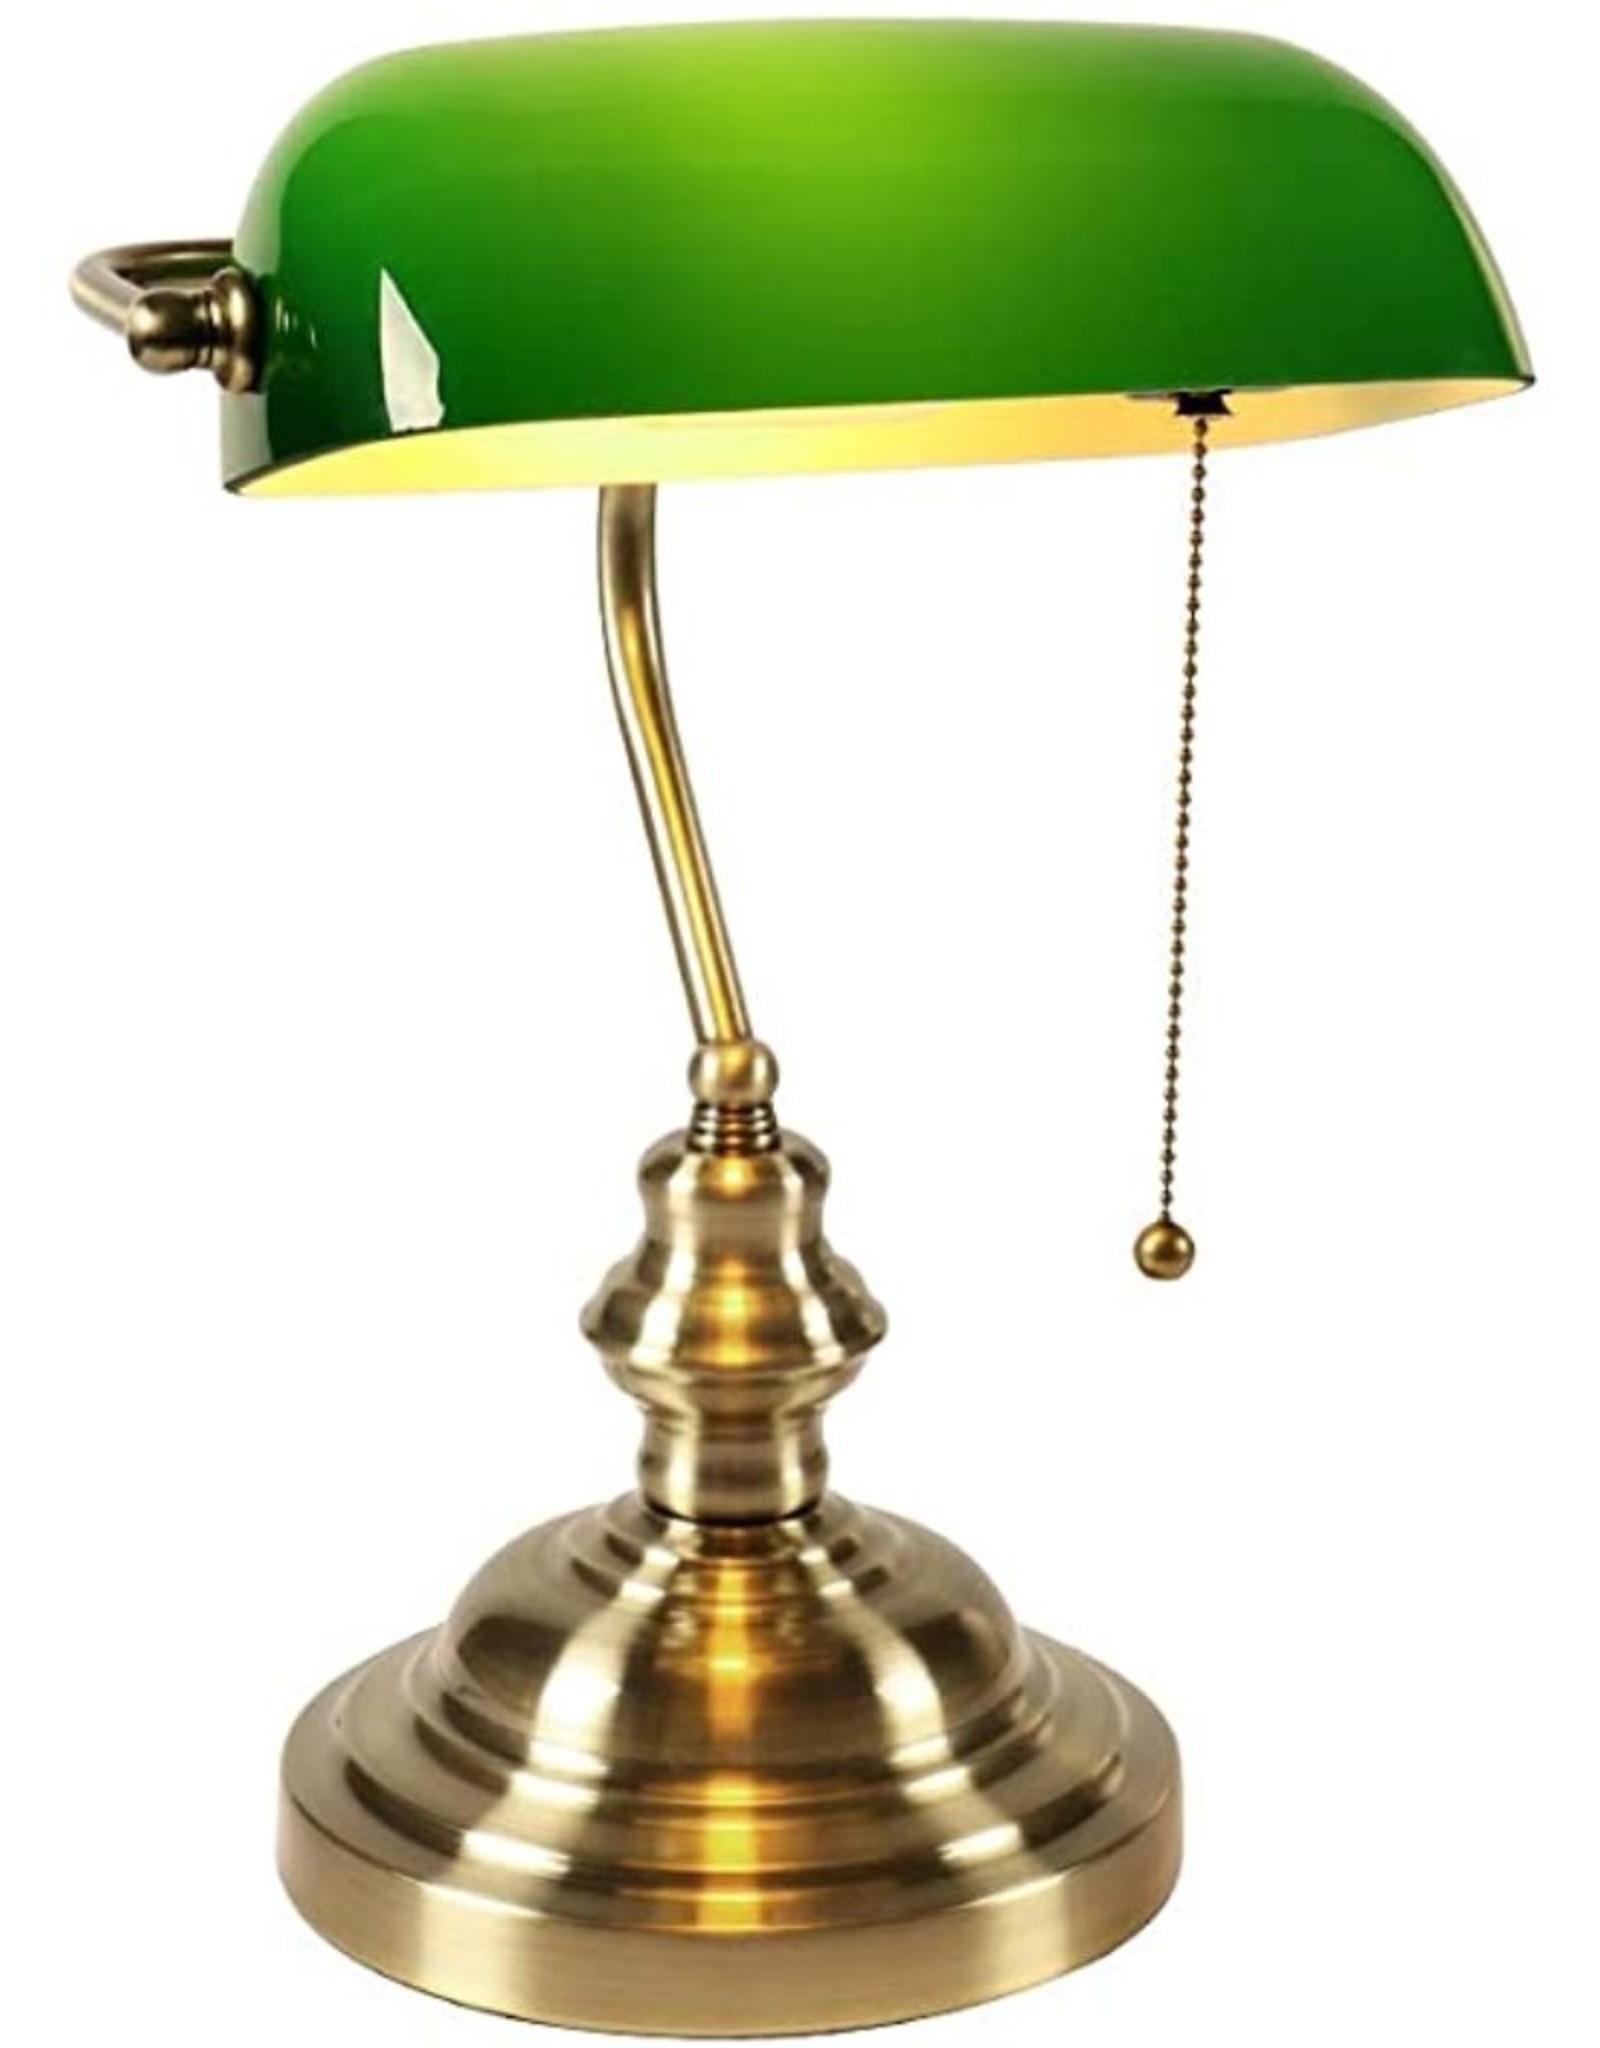 Klassieke bureaulamp-Notarislamp-bankierslamp-Art deco Miscellaneous - Bankierslamp met groene glazen kap Art Deco (enkele arm)